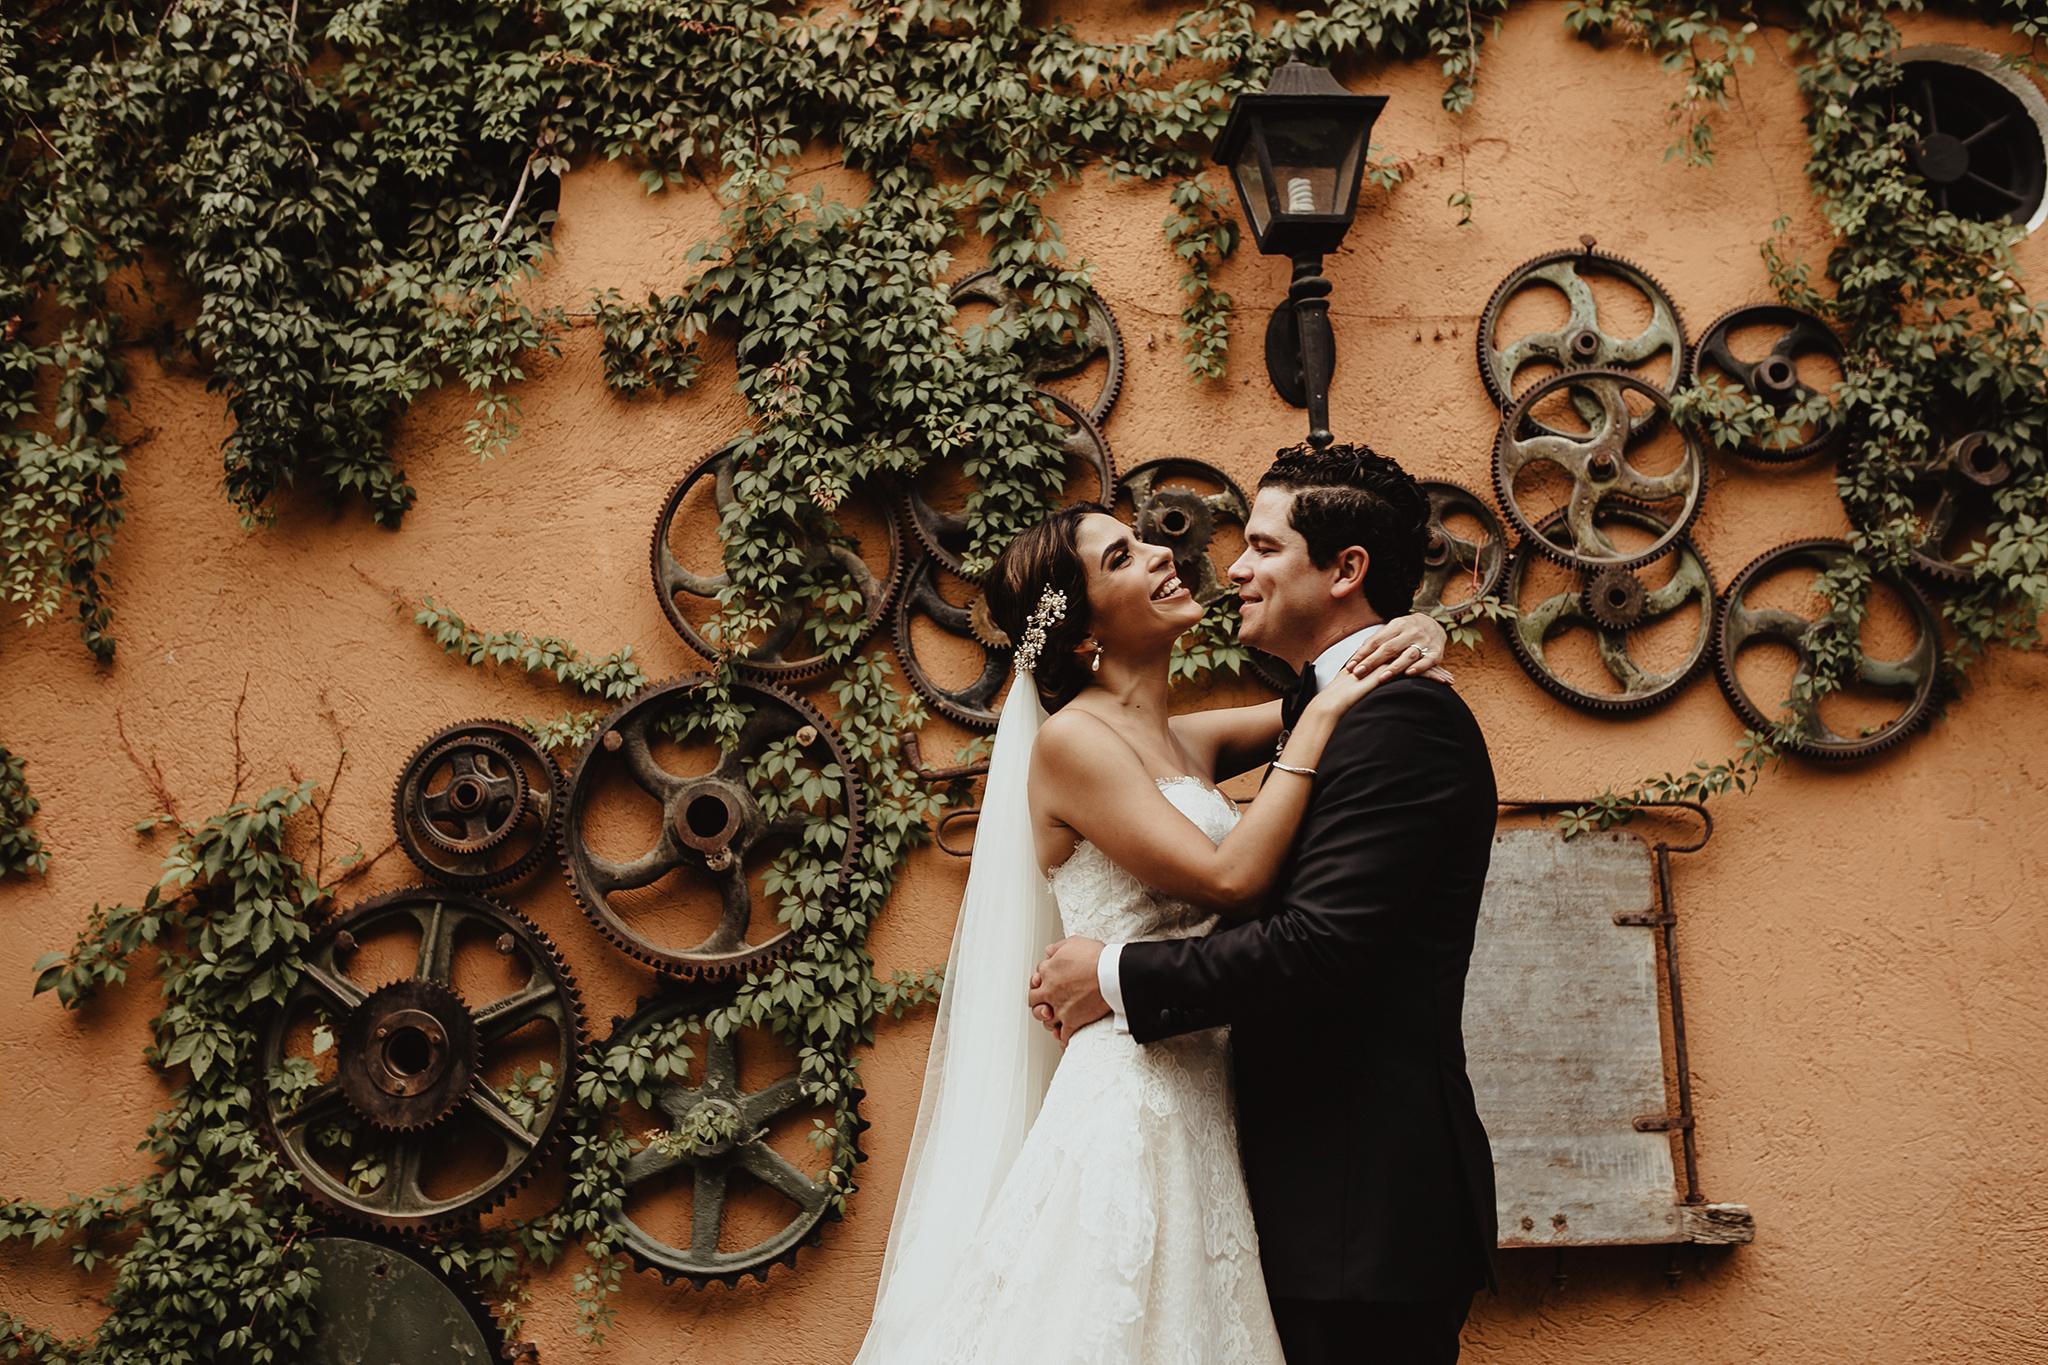 0177F&Yslide_WeddingDstination_MeridaYucatan_HaciendasMerida_BodasMexico_BodasYucatan_Boda_Destino.jpg